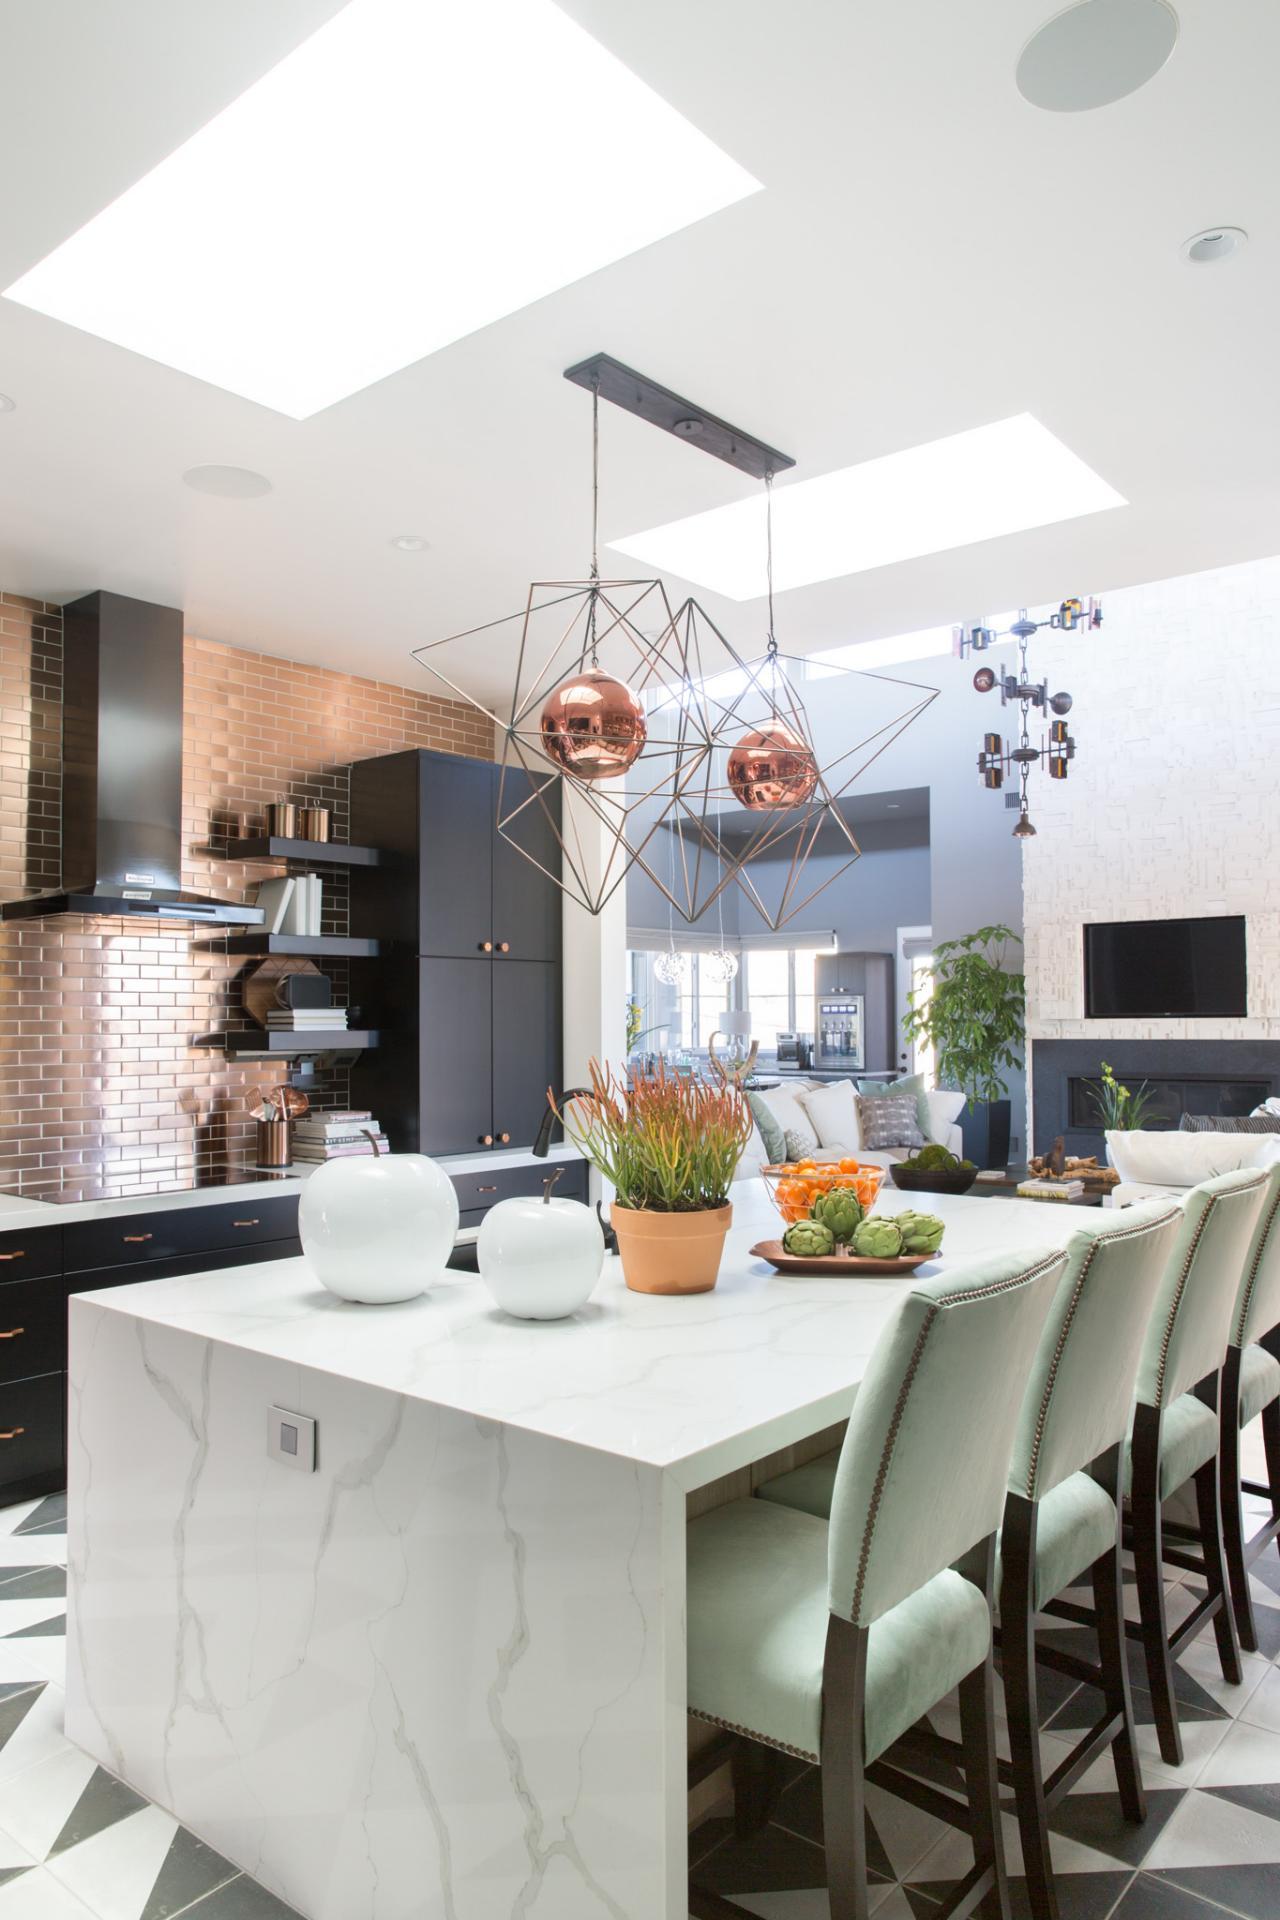 Pick Your Favorite Kitchen | HGTV Smart Home 2018 | HGTV